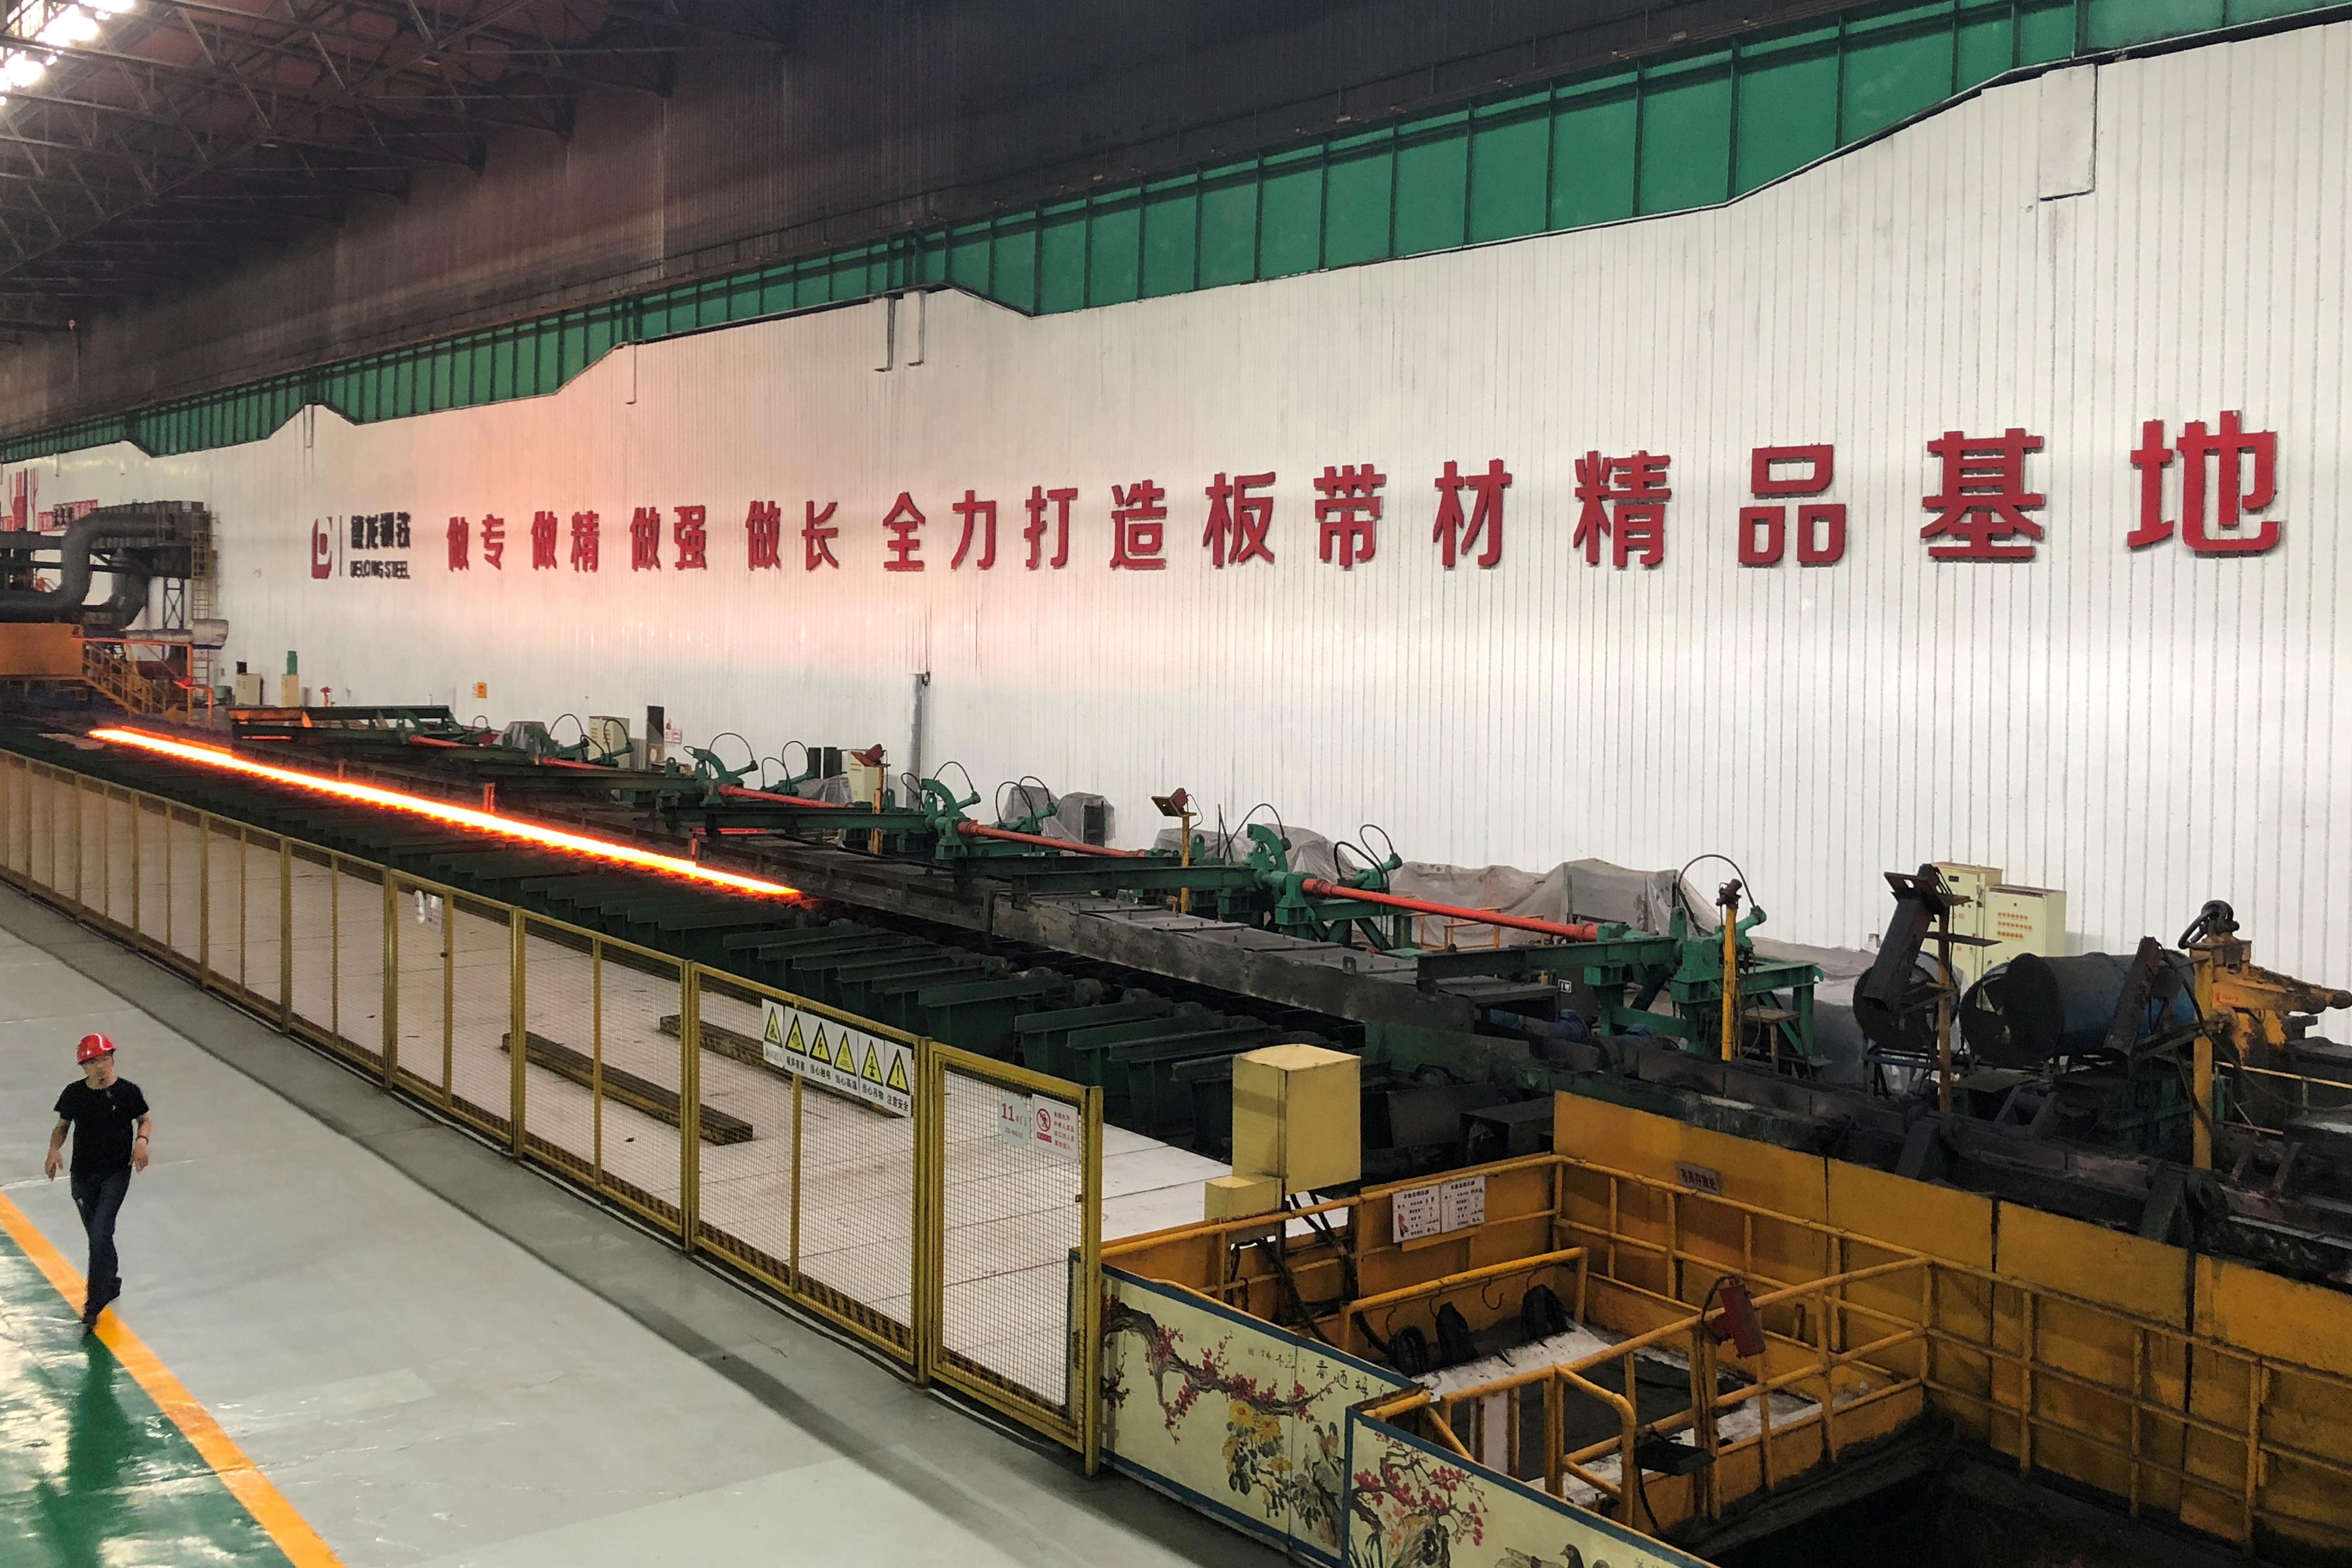 A man walks inside a steel plant of Delong Steel in Xingtai, Hebei province, China June 20, 2019. Picture taken June 20, 2019.  REUTERS/Muyu Xu/File Photo